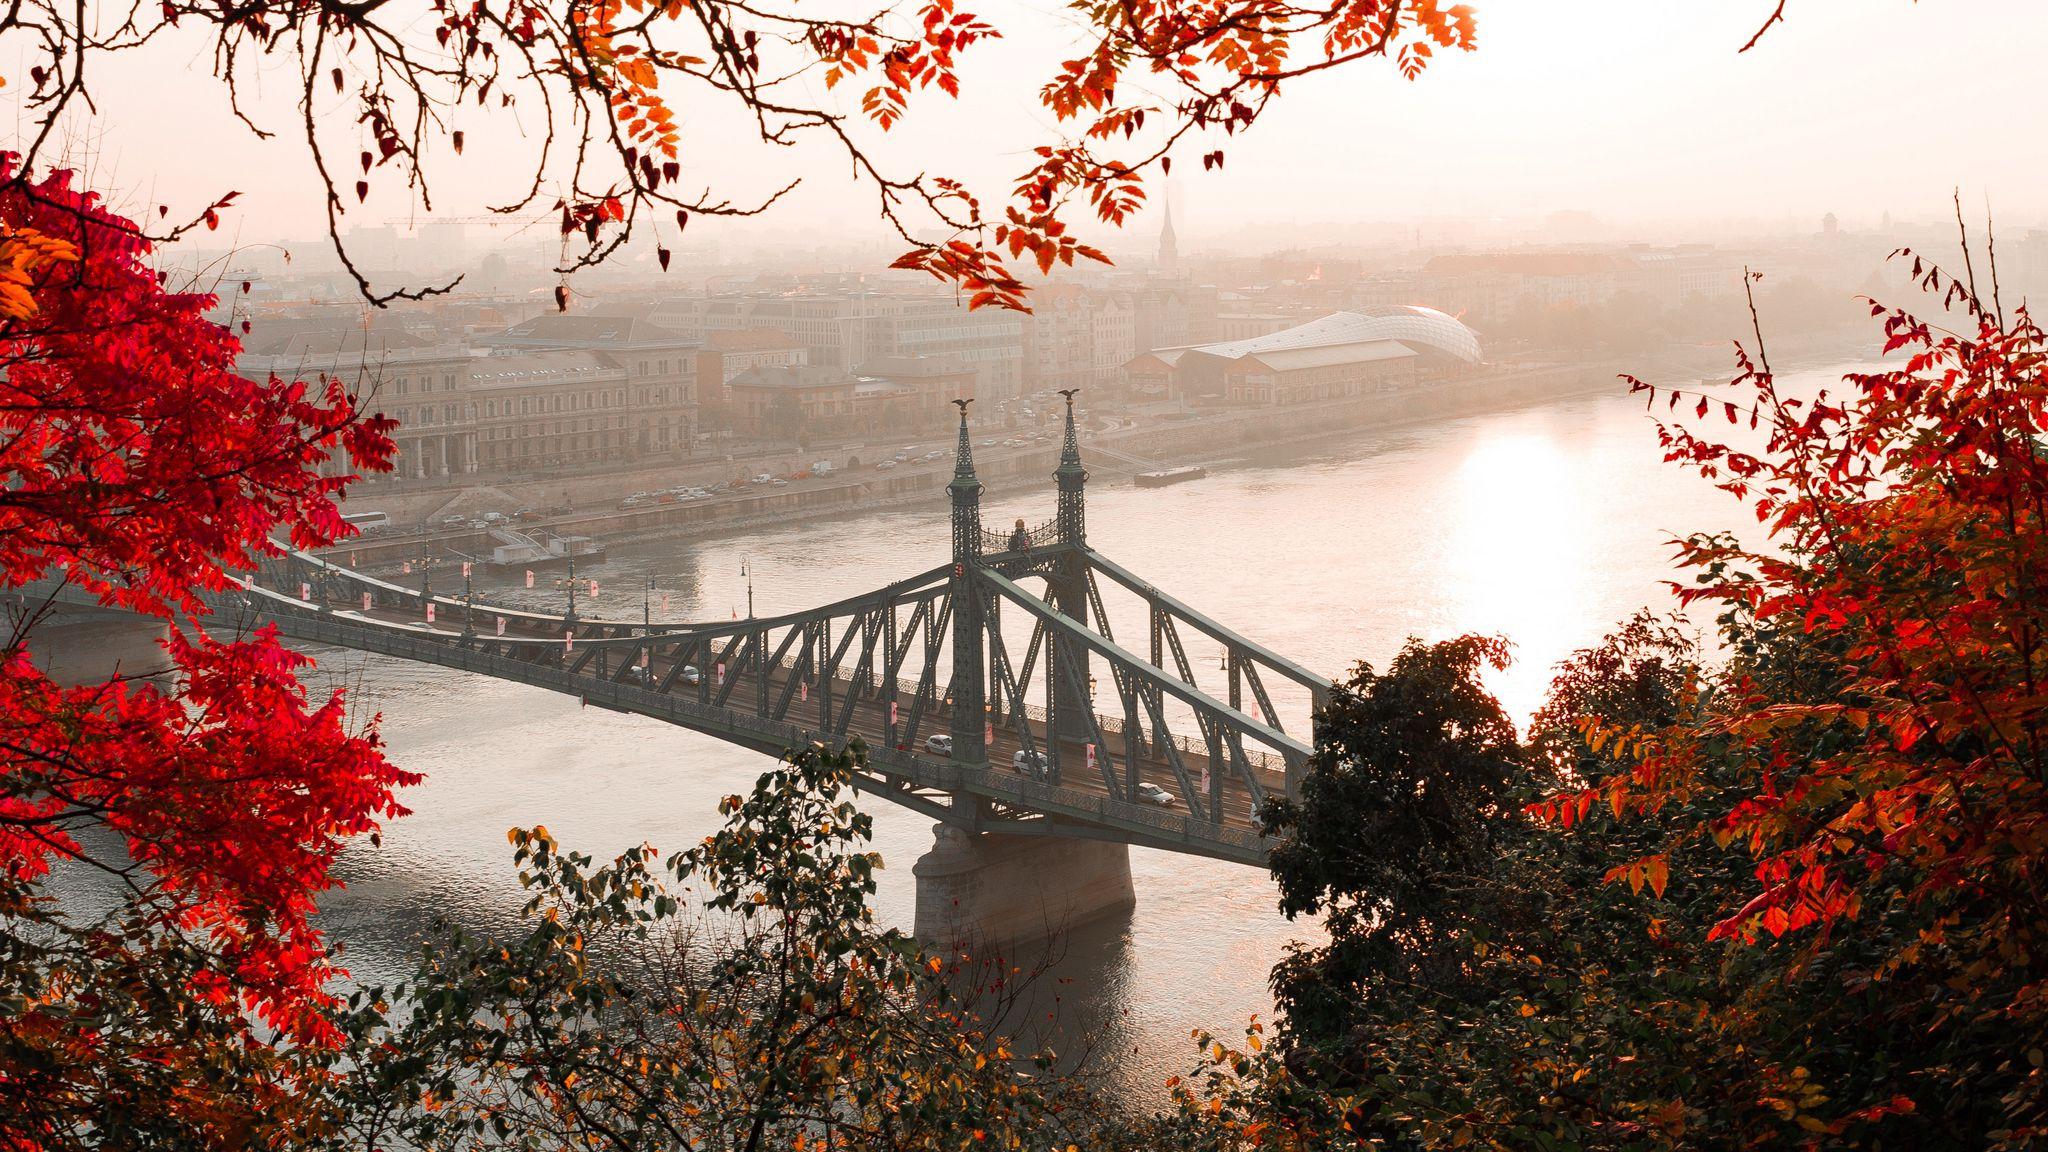 2048x1152 Wallpaper bridge, autumn, city, citadella, budapest, hungary